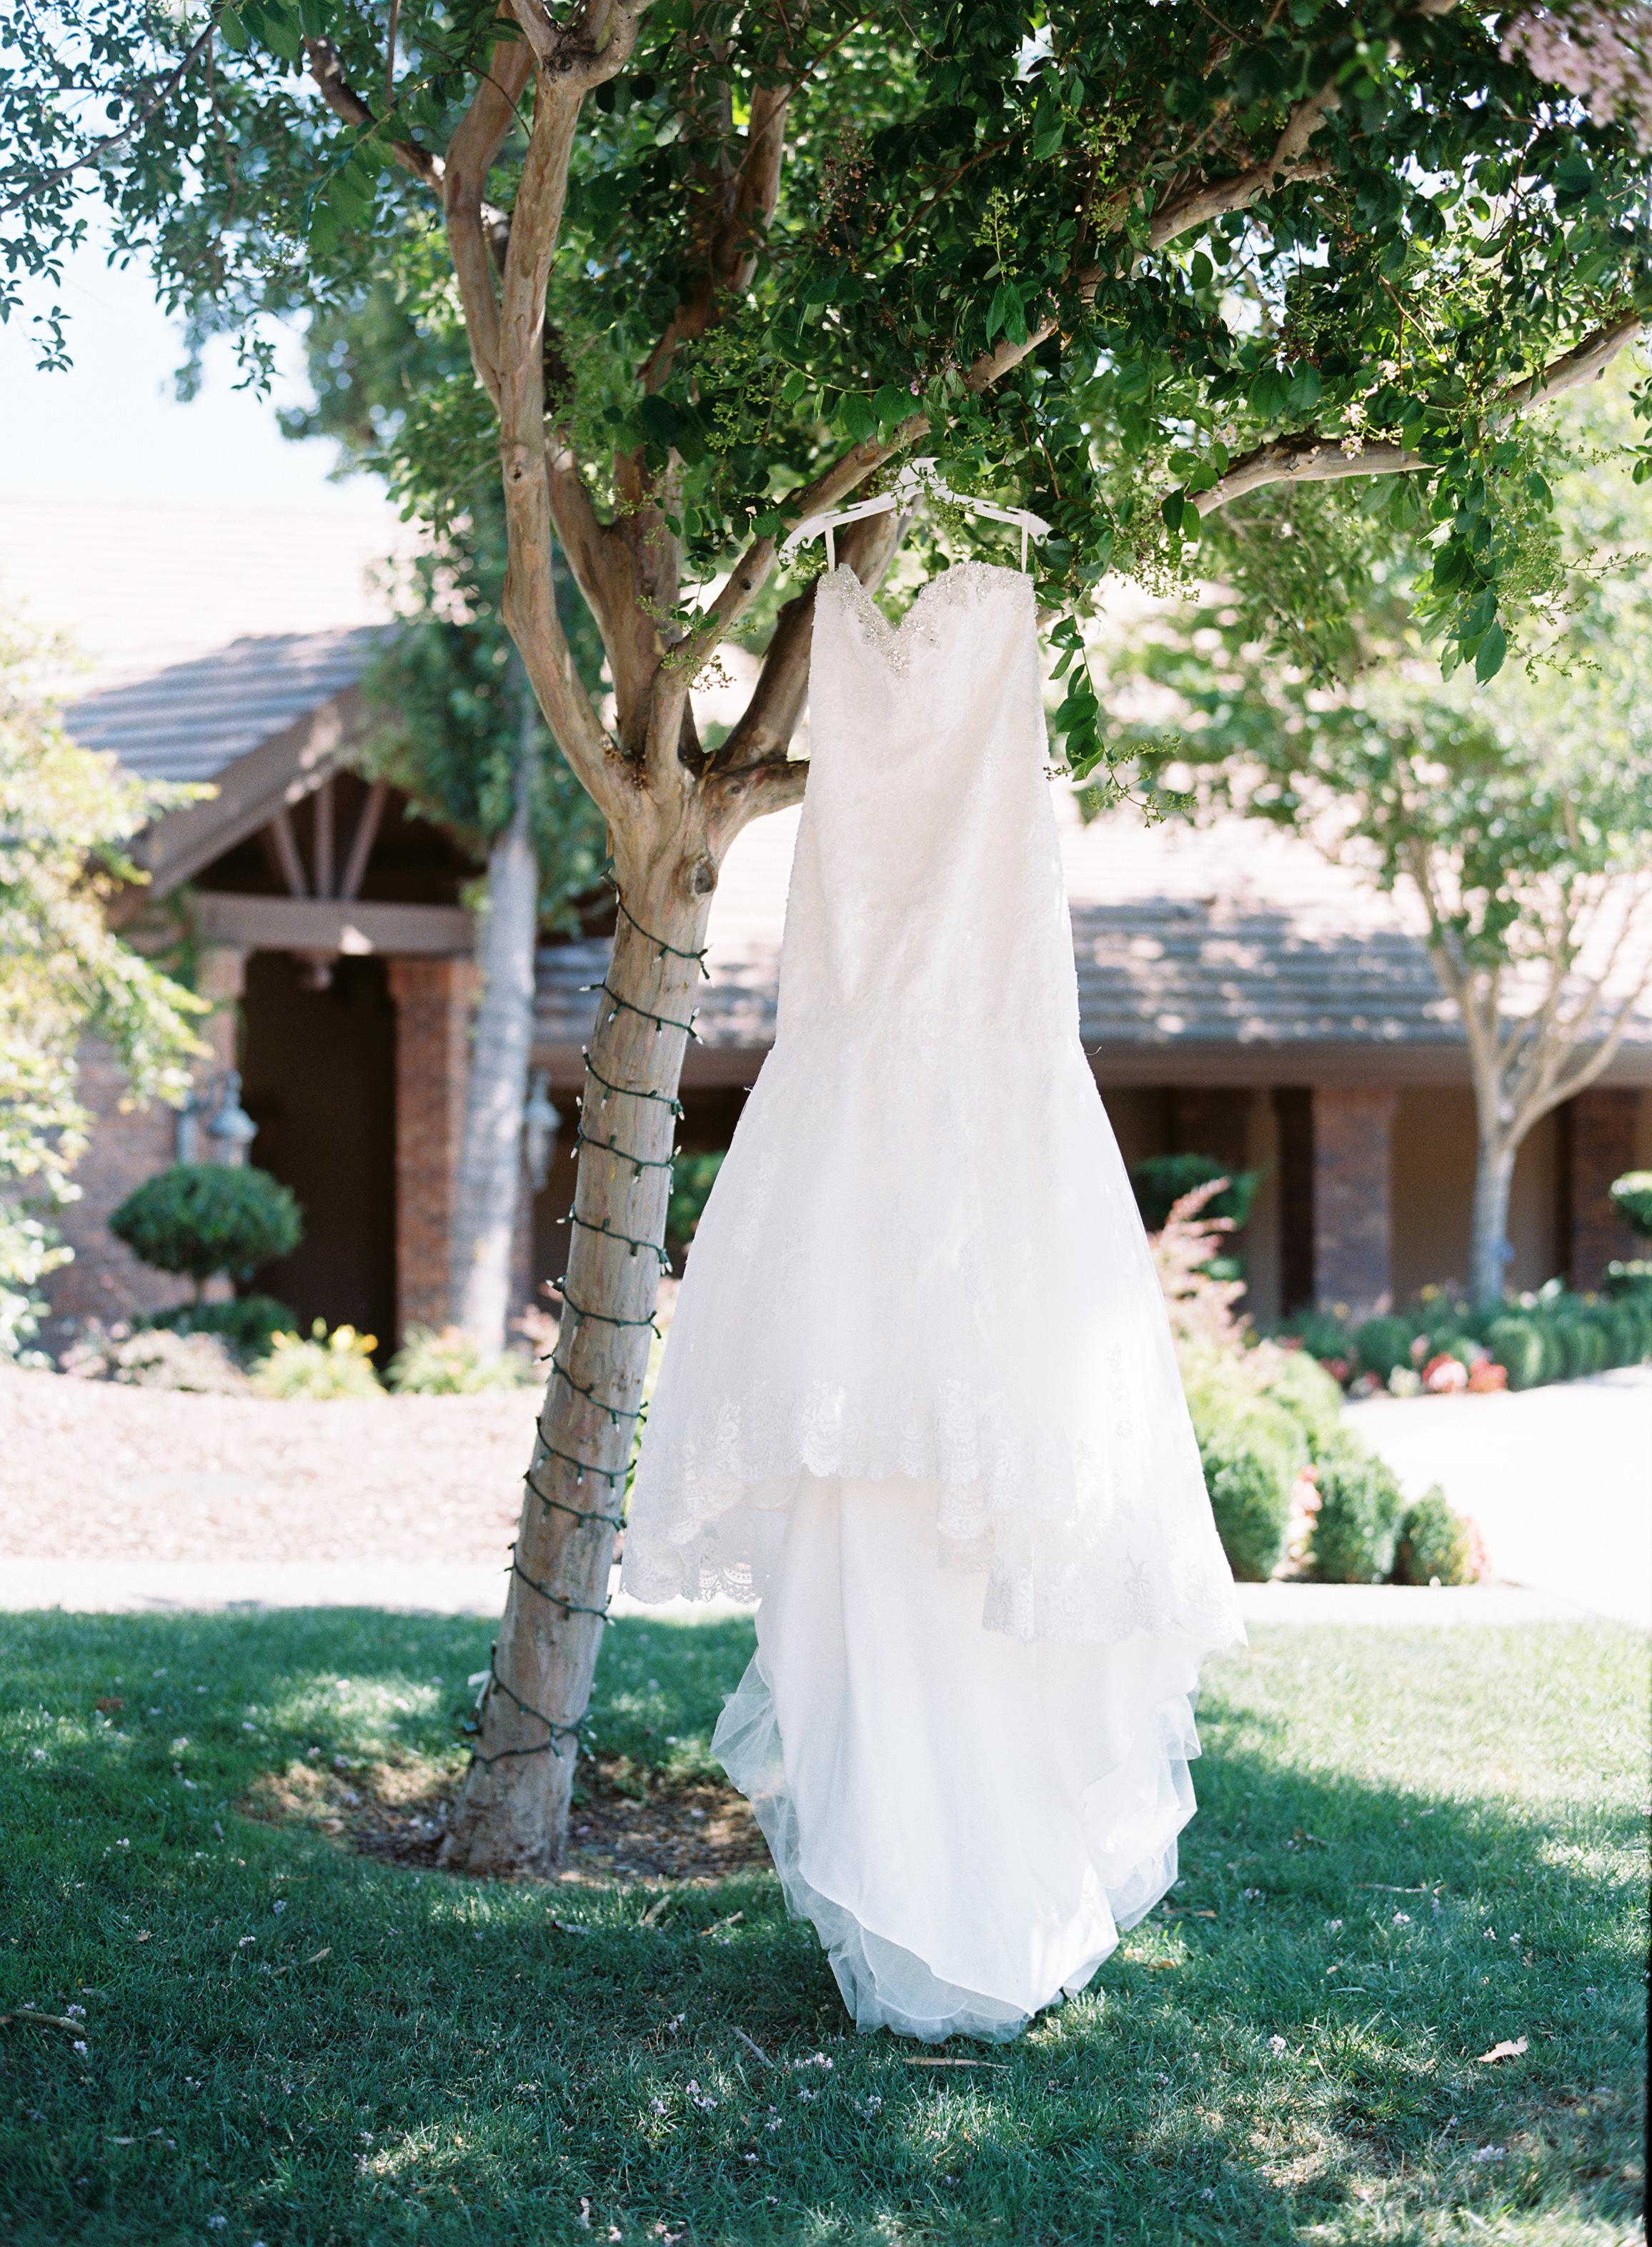 hawaiian-inspired-wedding-in-danville-california-013-4.jpg